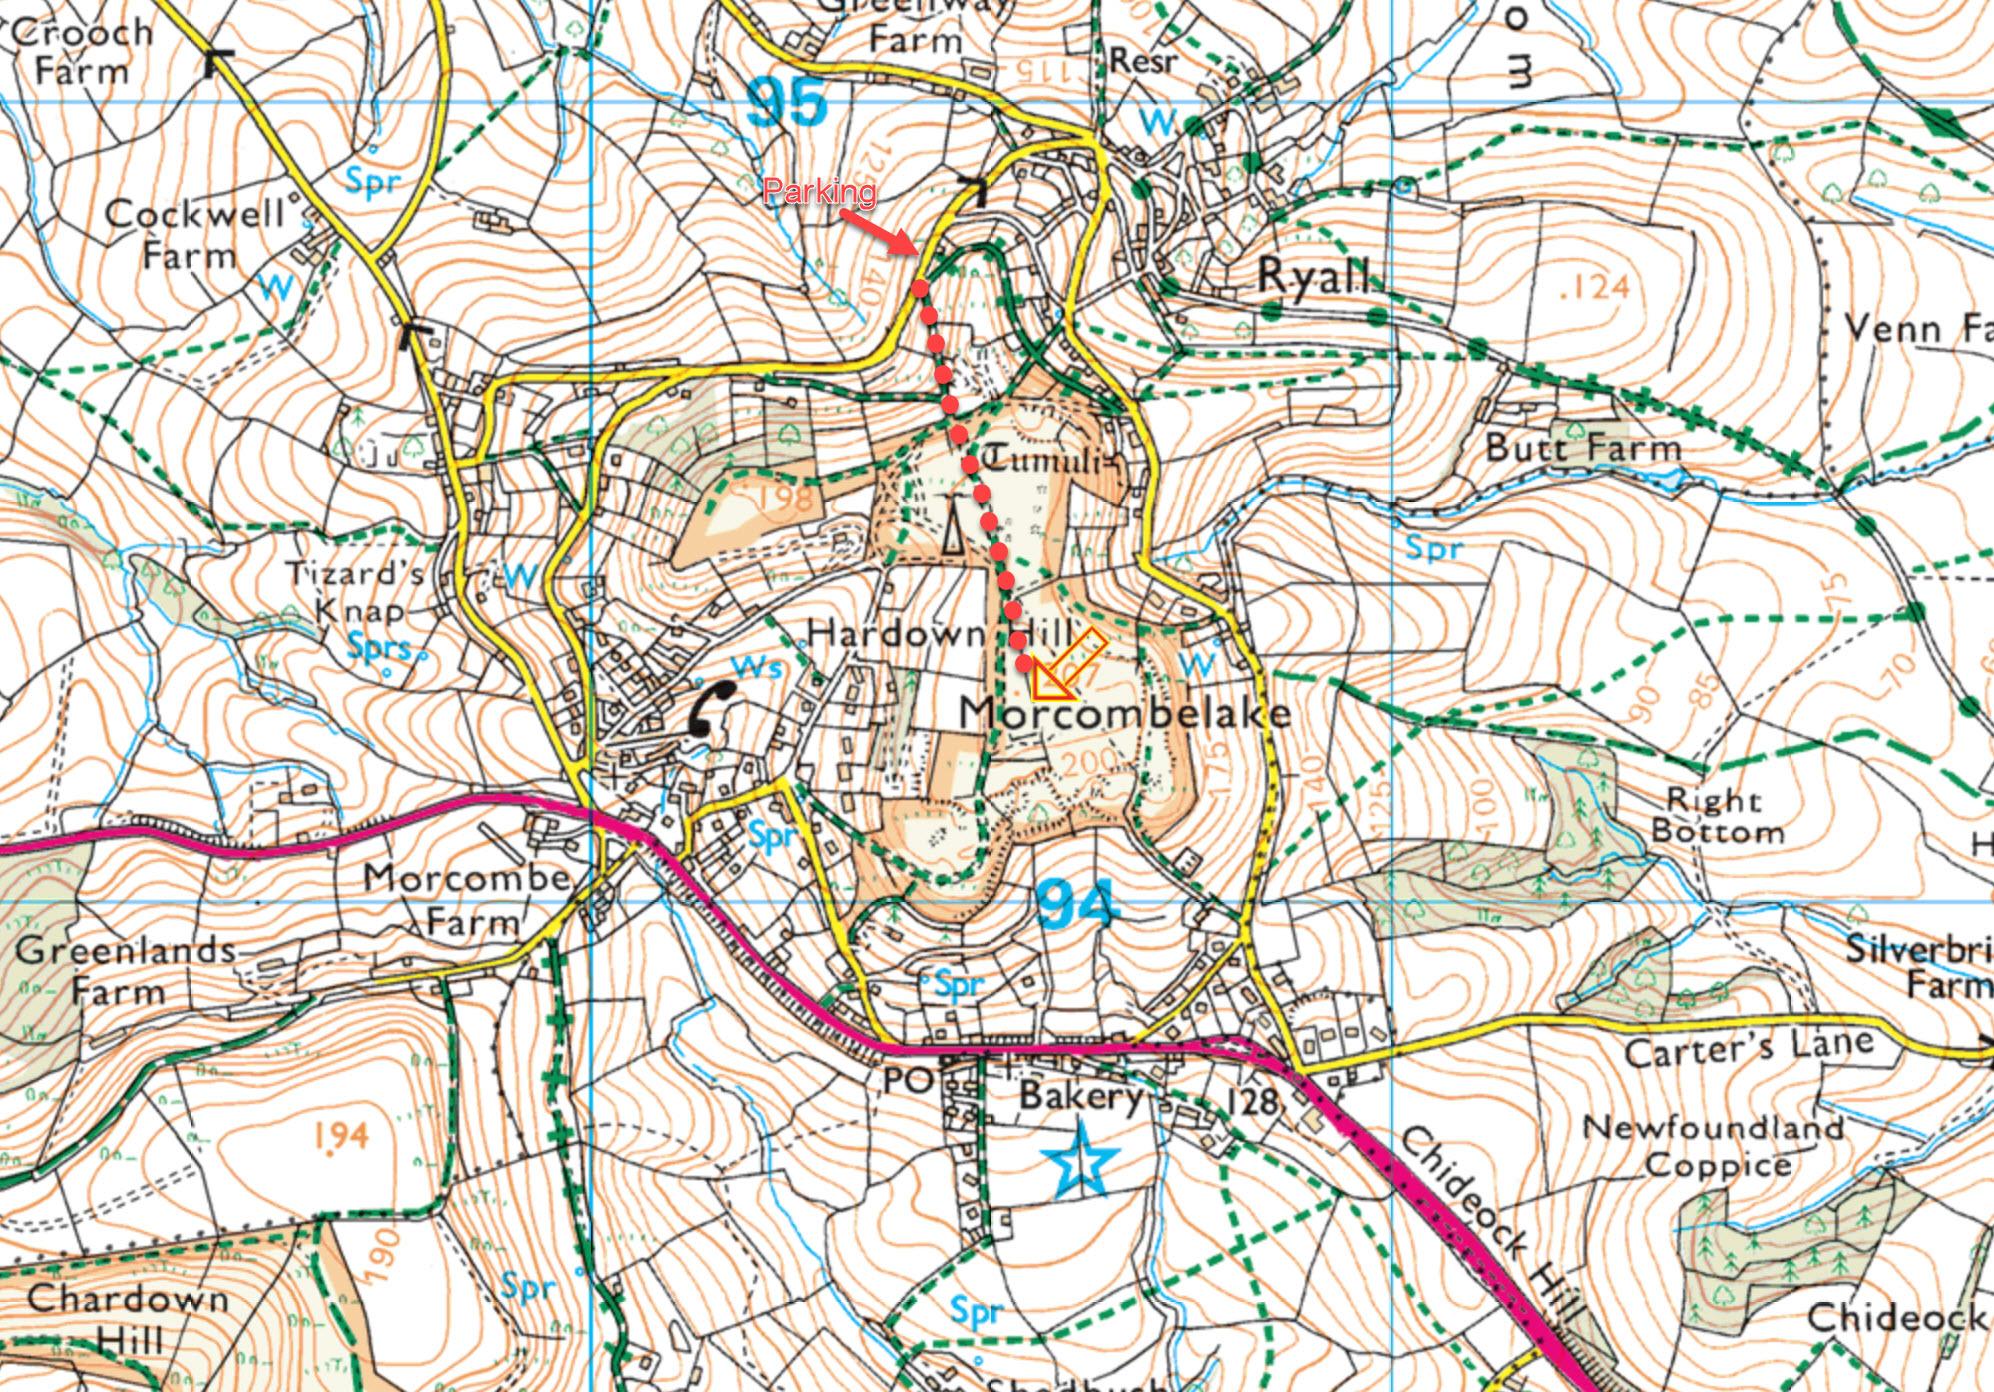 Hardown Hill map